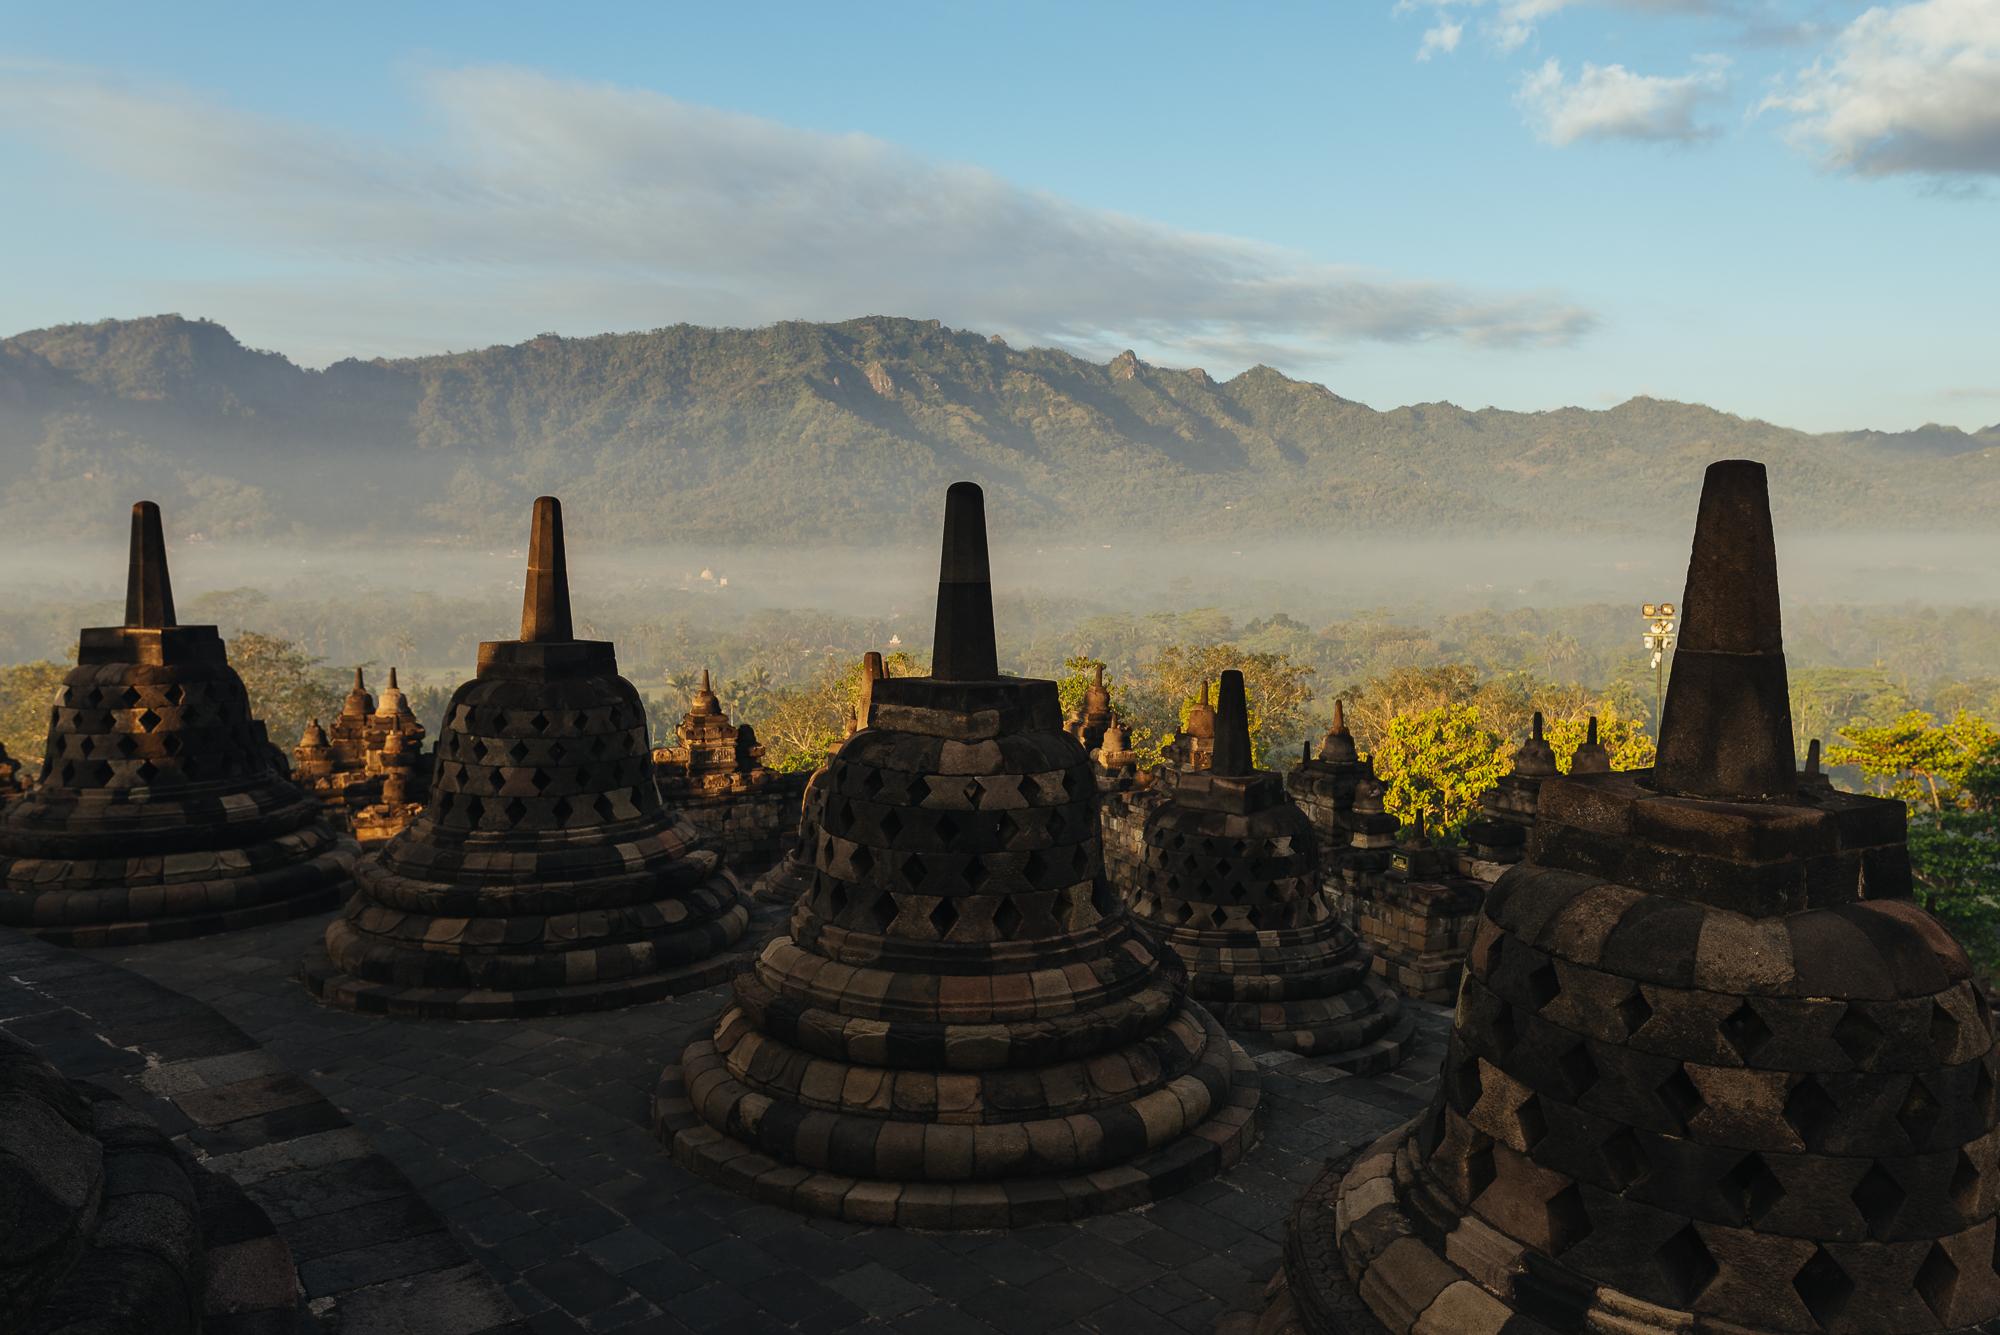 indonesia_2017-1123.jpg